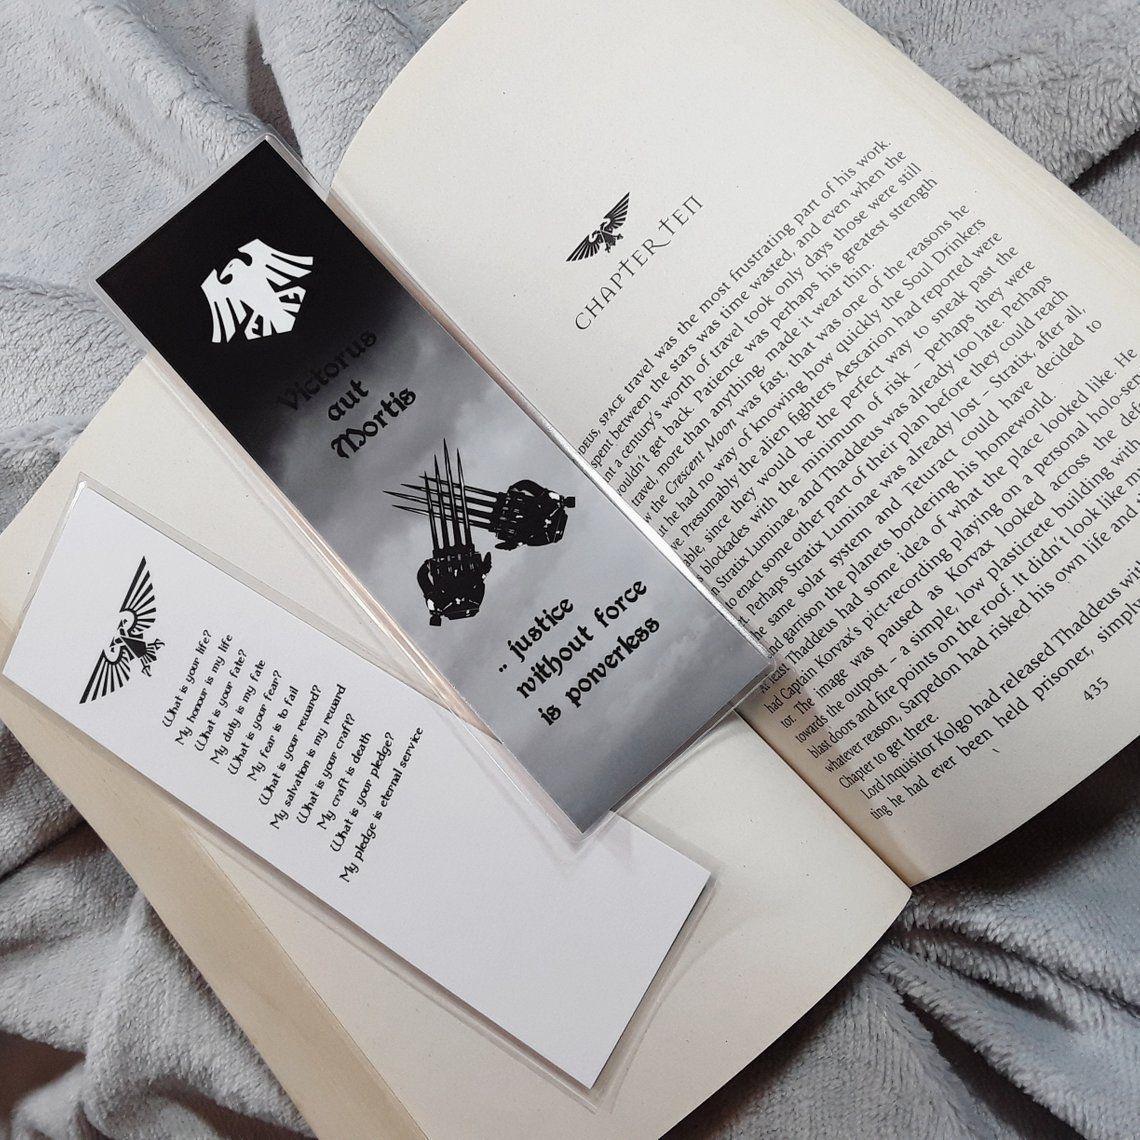 Warhammer Raven Guard Inspired Bookmark Etsy Bookmarks Handmade Glossy Photo Paper Warhammer [ 1140 x 1140 Pixel ]